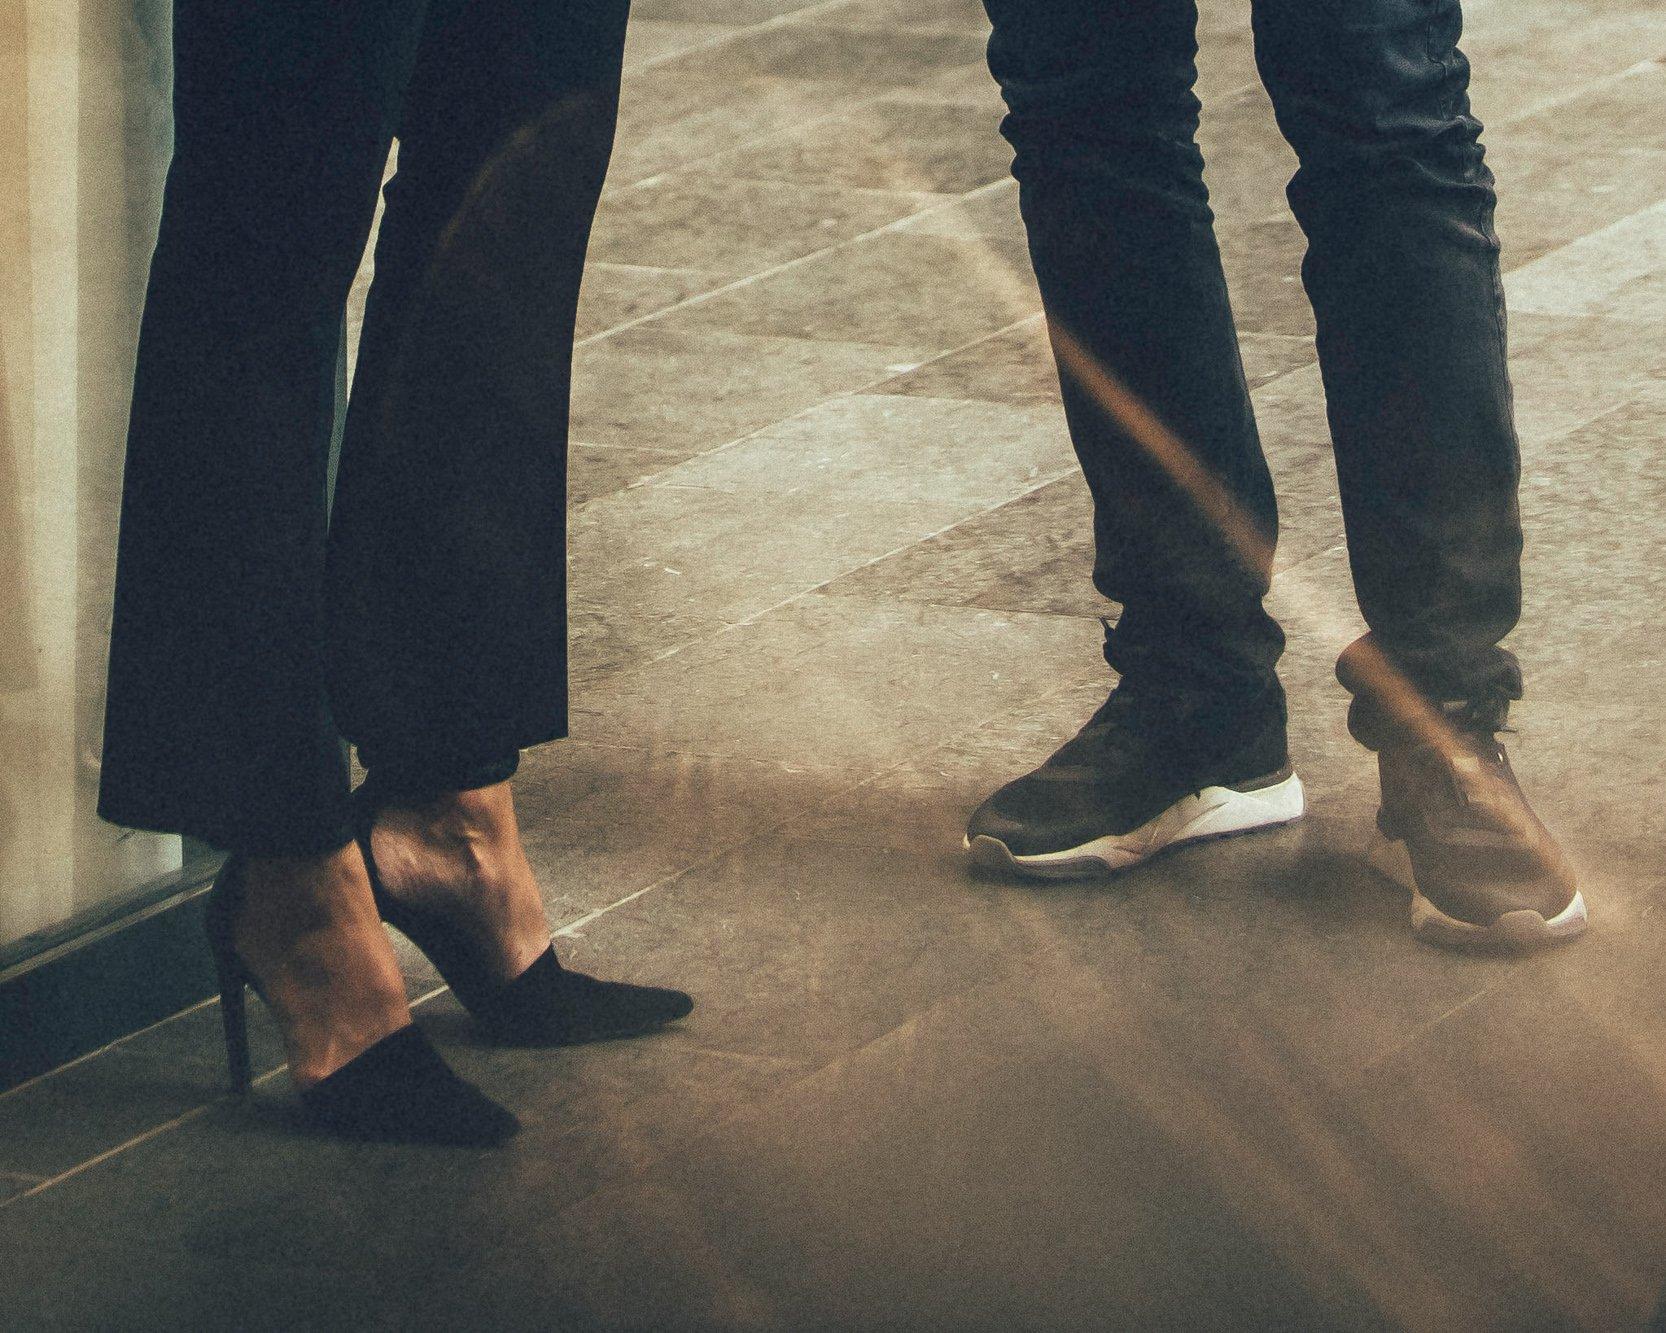 sneakers-och-hogklackadeskor